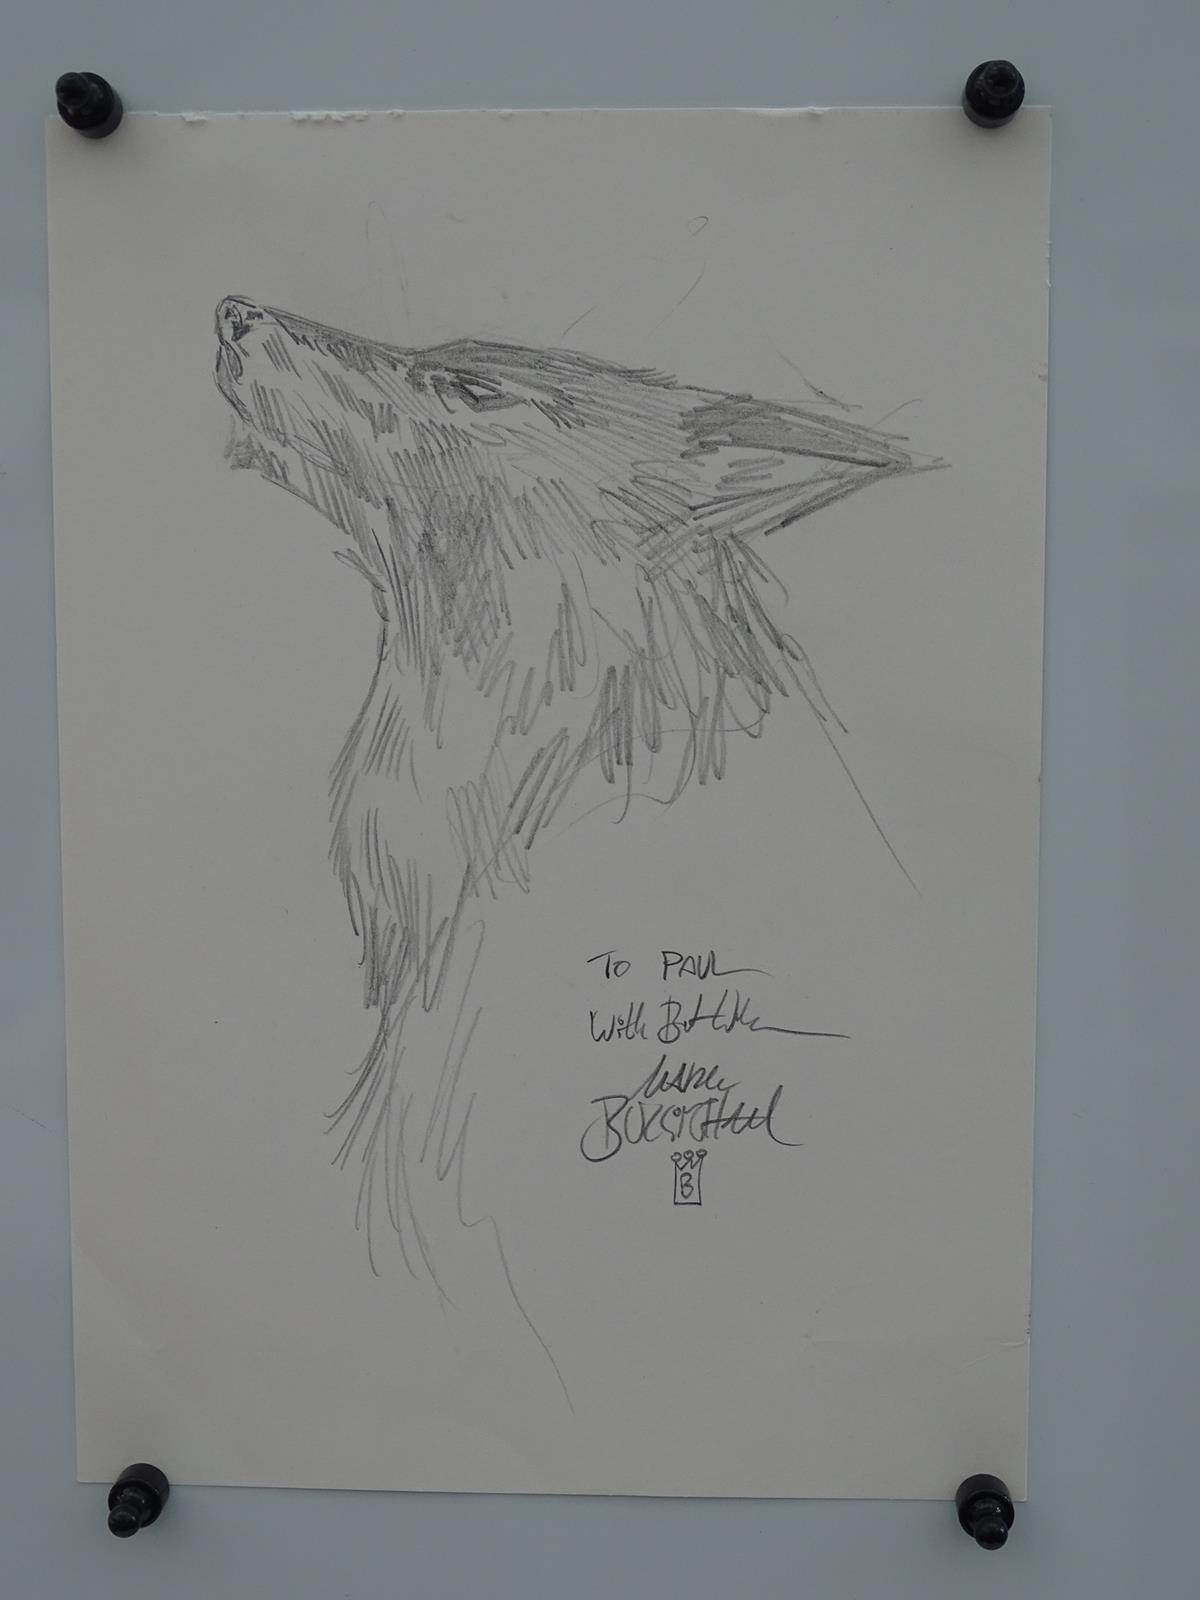 Lot 2147 - MARK BUCKINGHAM ORIGINAL 'WOLF' DRAWING - SIGNED BY ARTIST MARK BUCKINGHAM - Pencil, graphite sketch